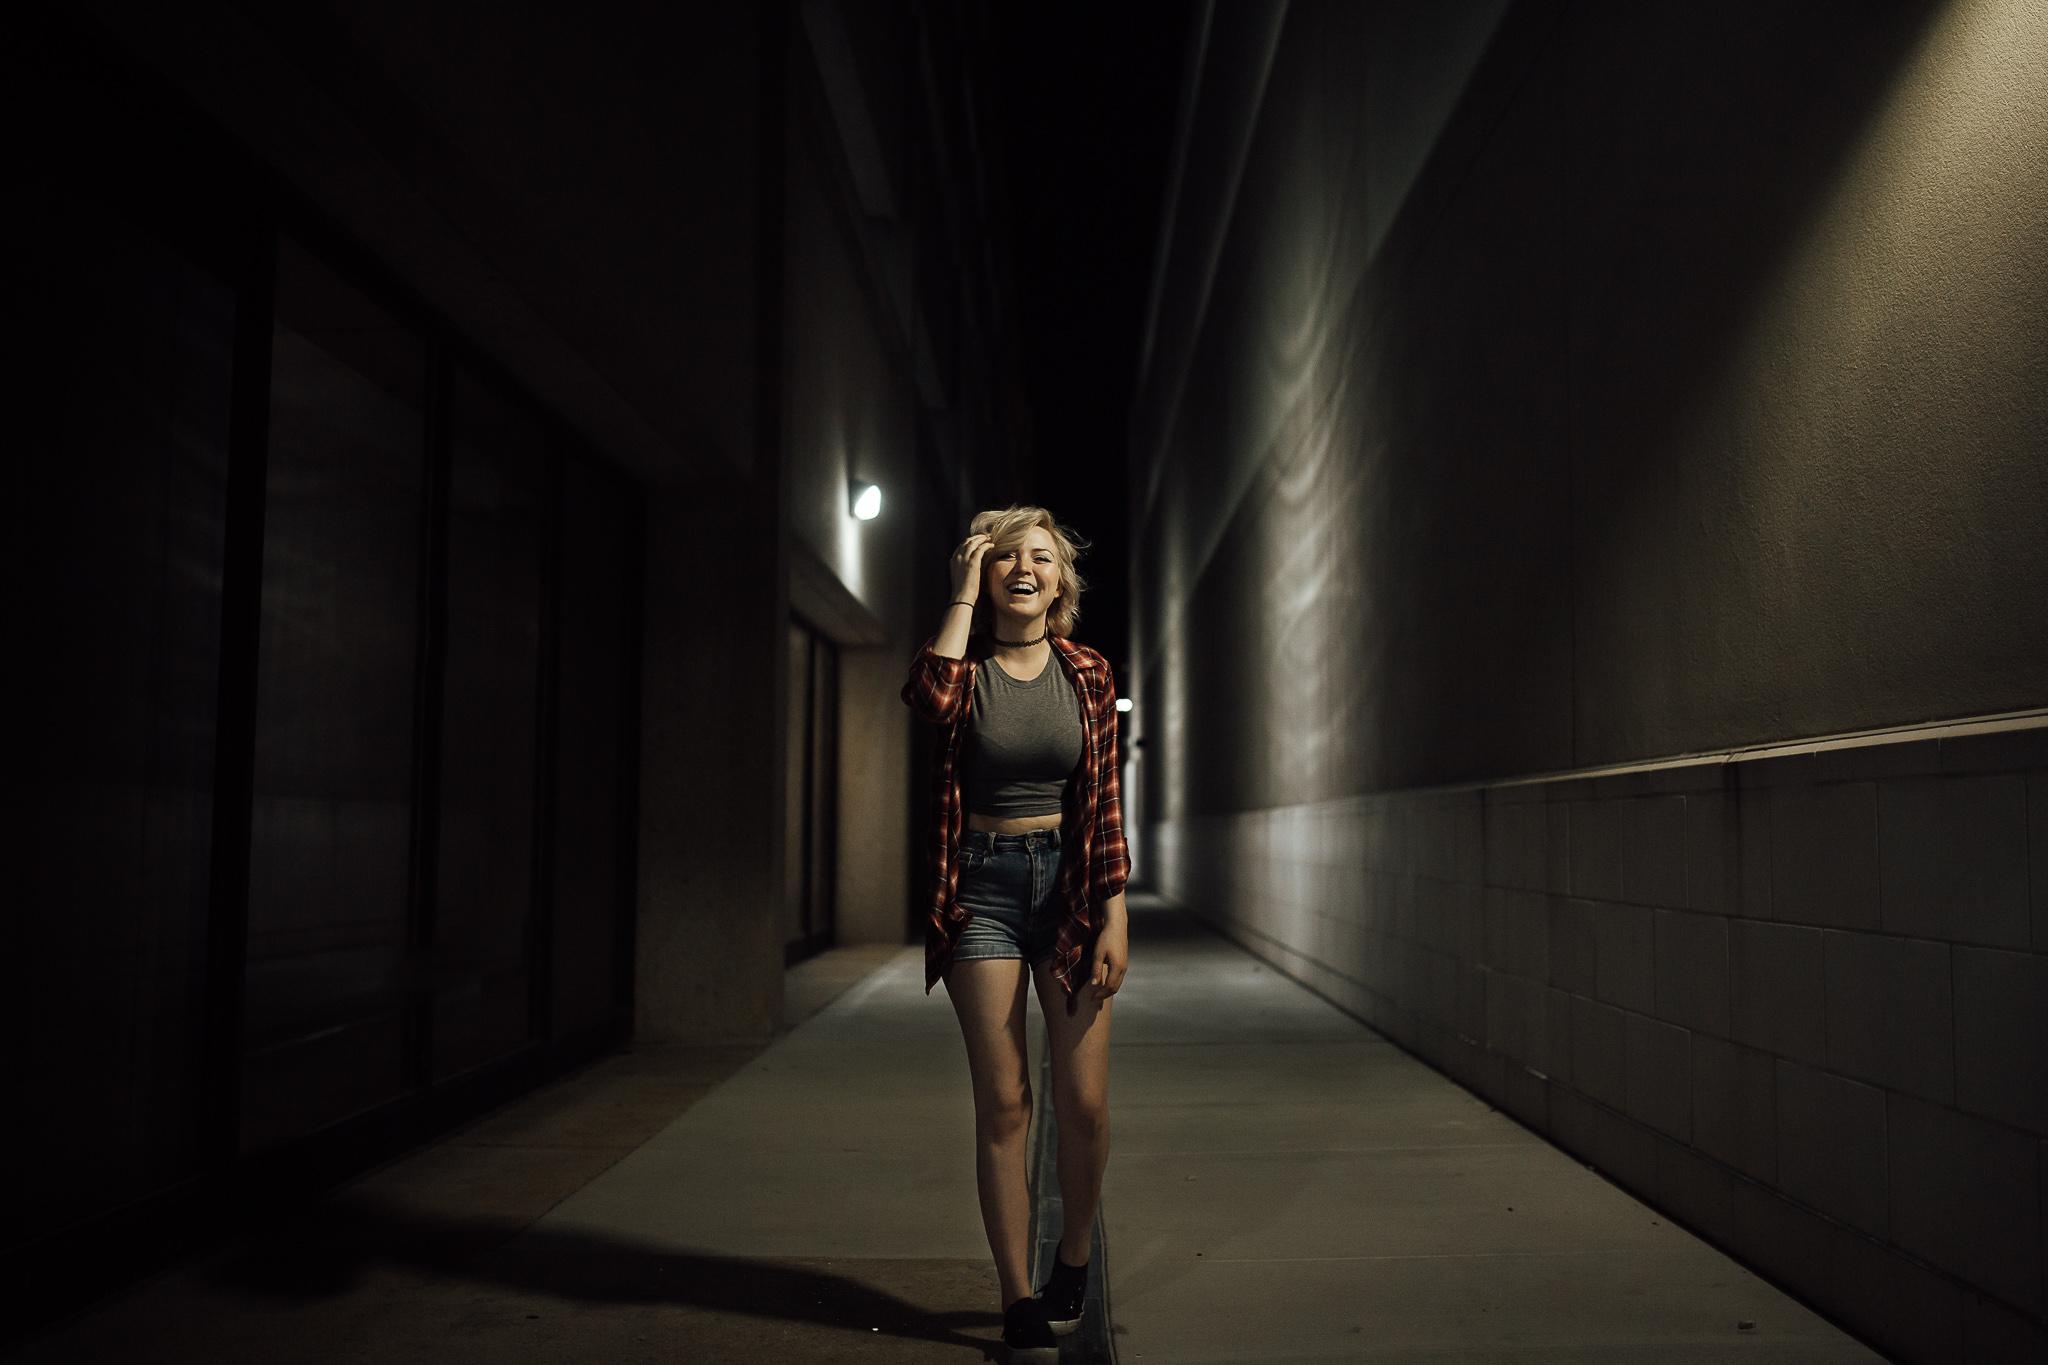 downtown-memphis-night-photography-memphis-night-life-model